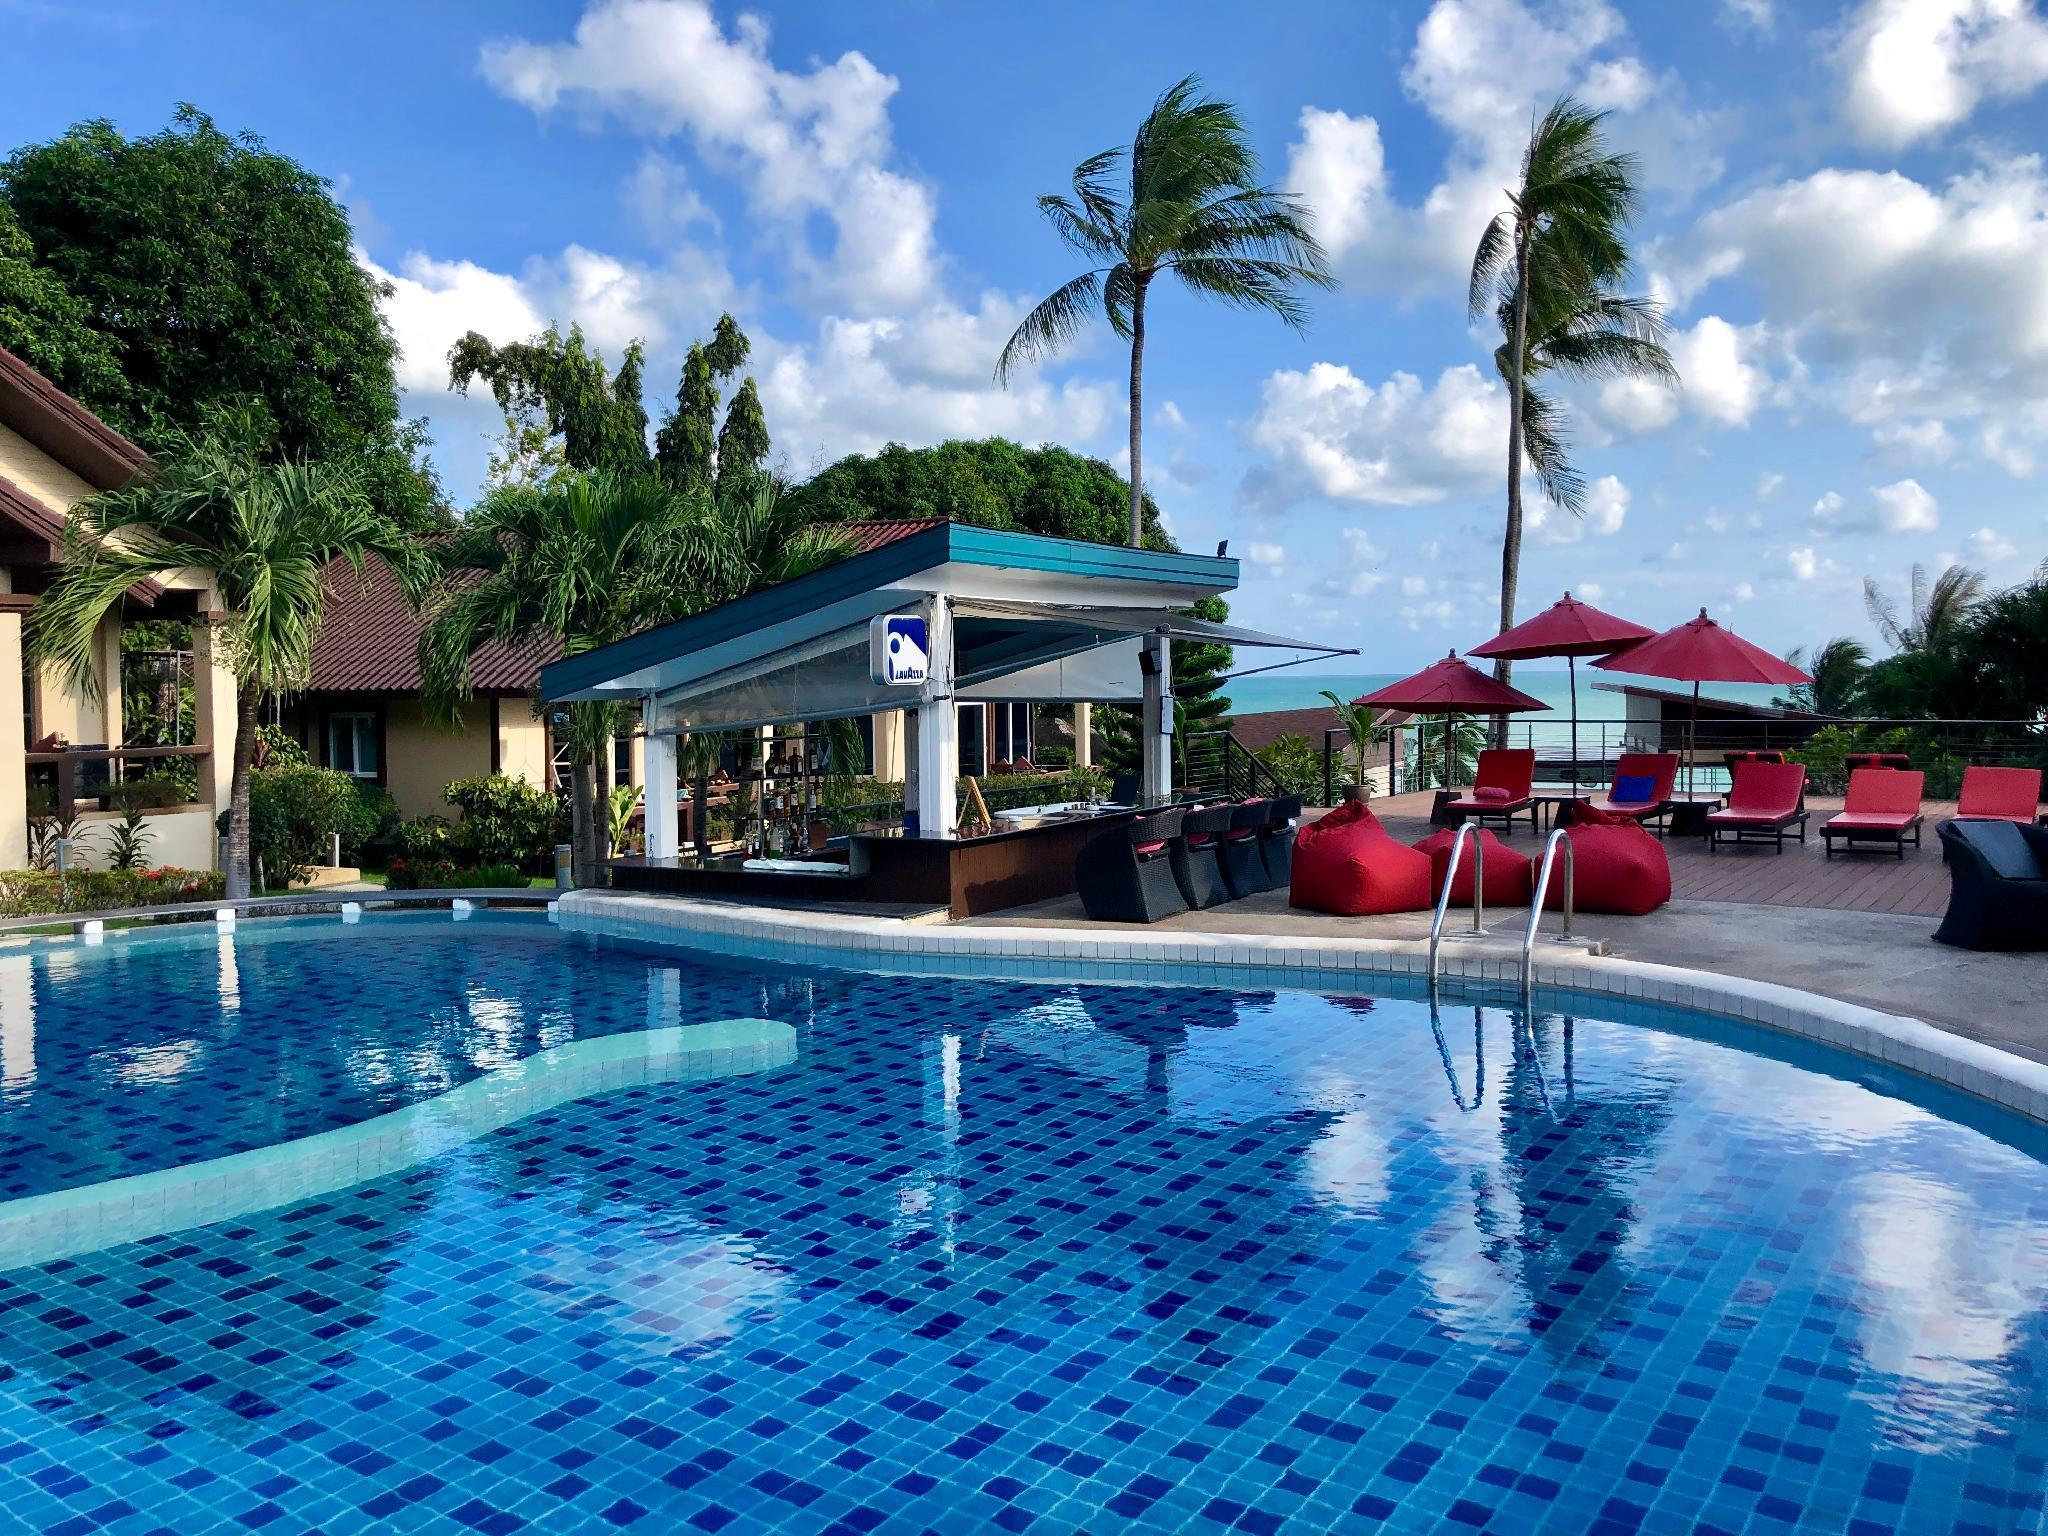 Royal Beach Boutique Resort and Spa รอยัลบีช บูทิค รีสอร์ต แอนด์ สปา